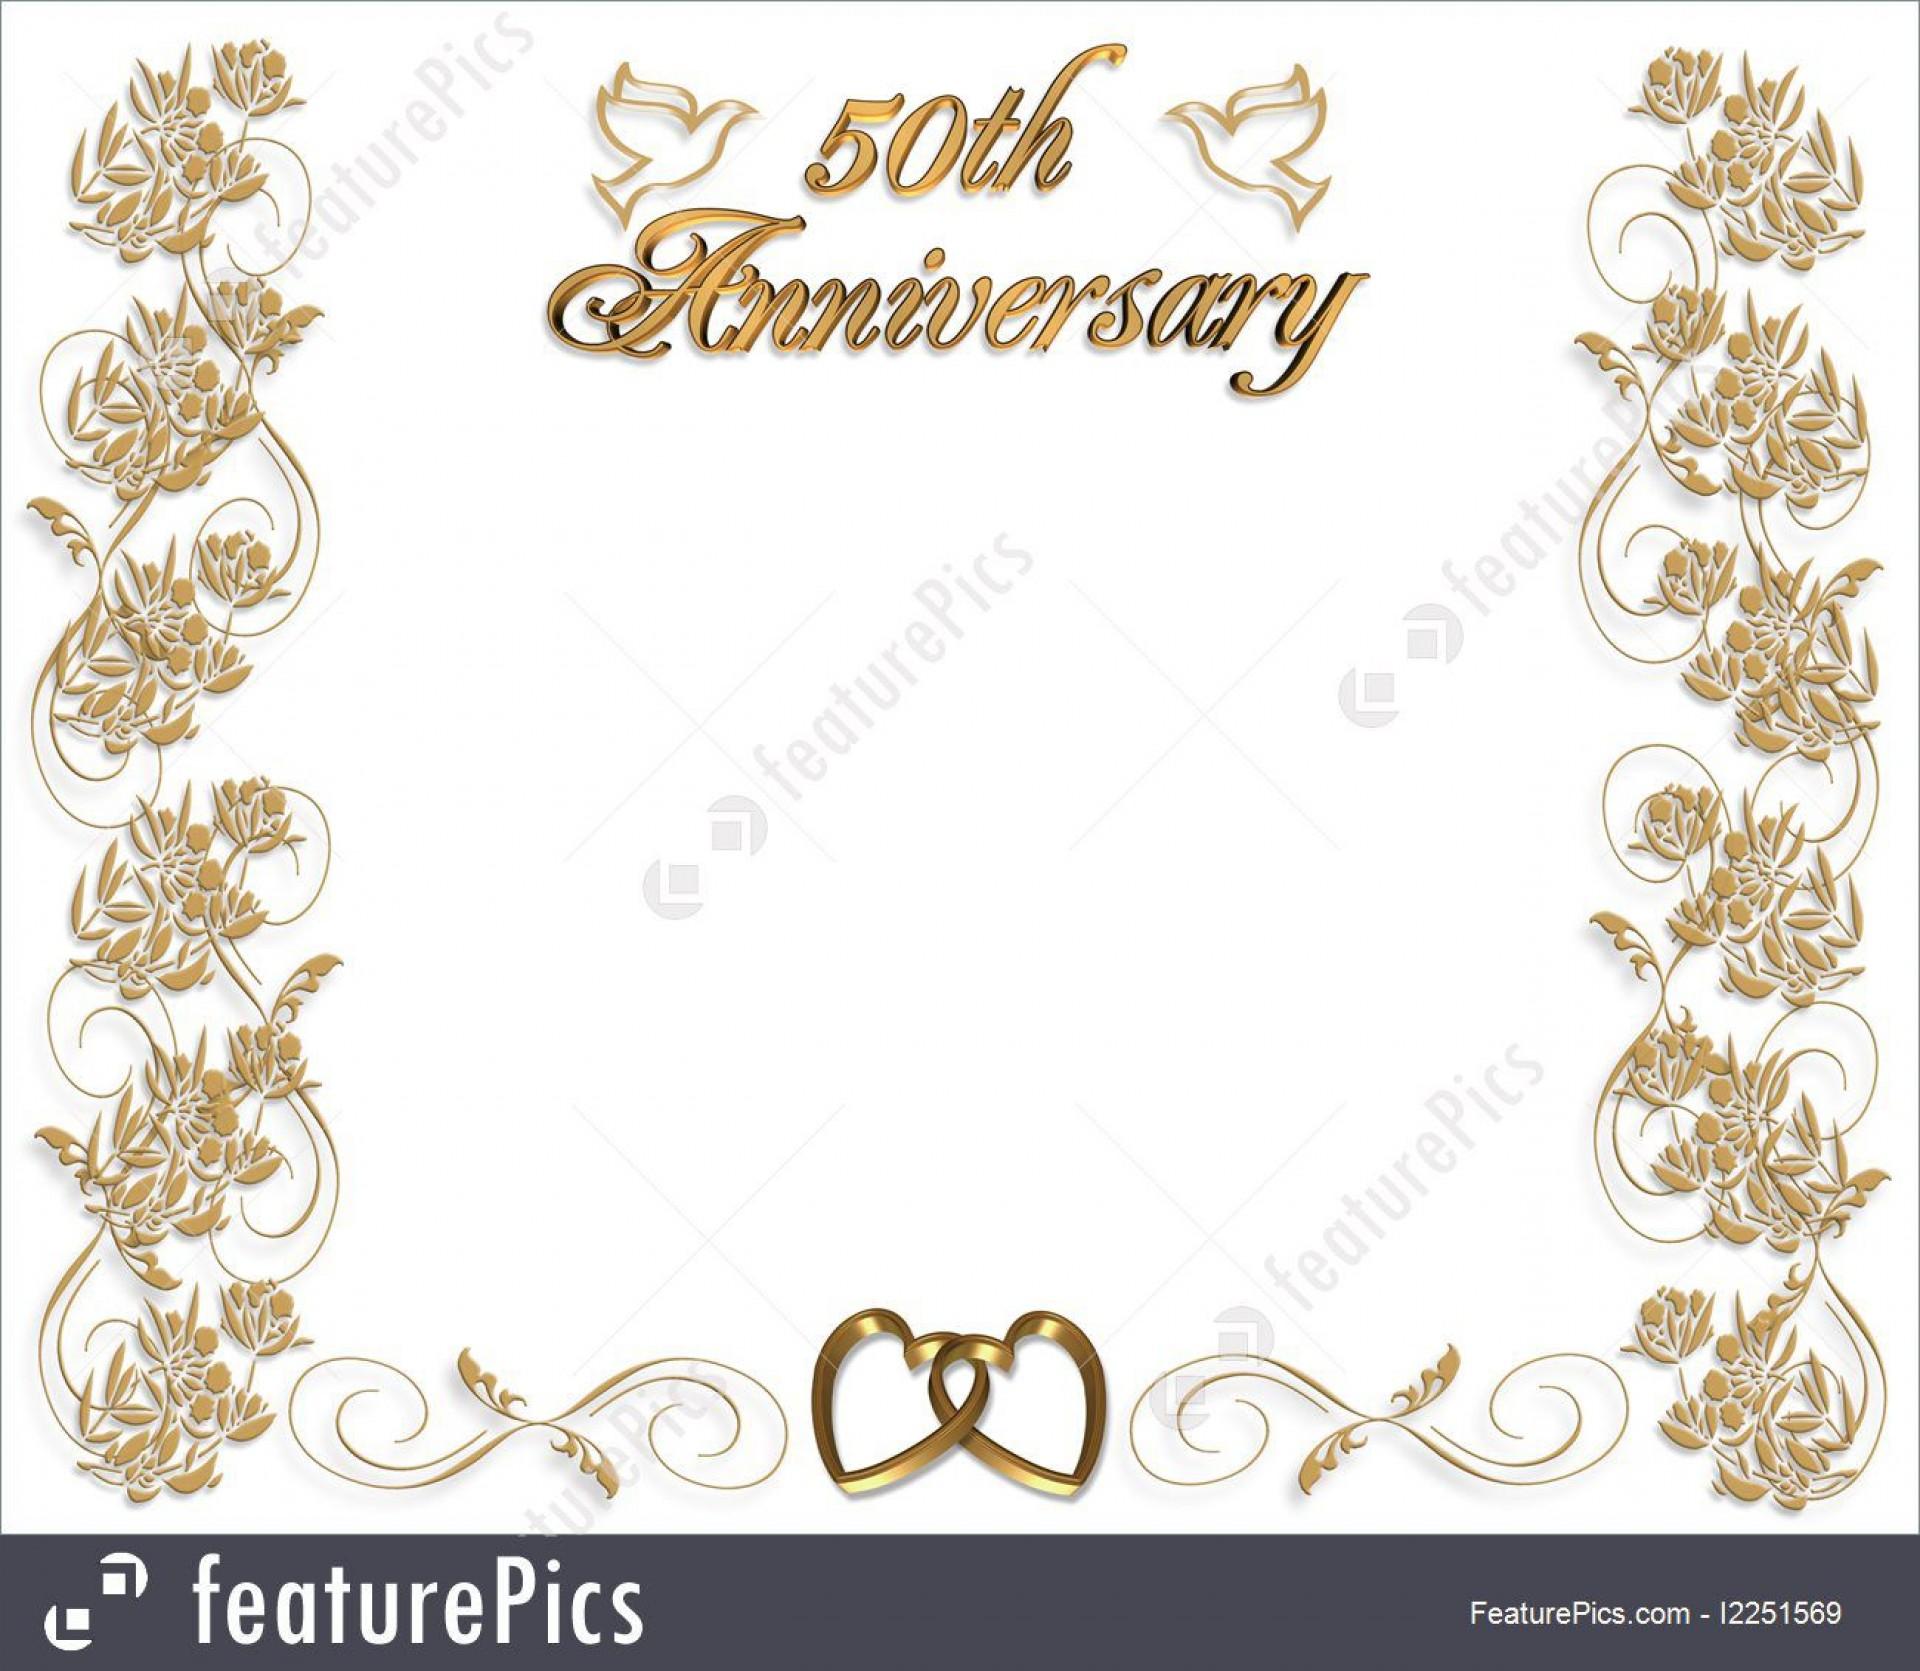 008 Marvelou 50th Wedding Anniversary Invitation Sample Design  Samples Free Party Template Card Idea1920